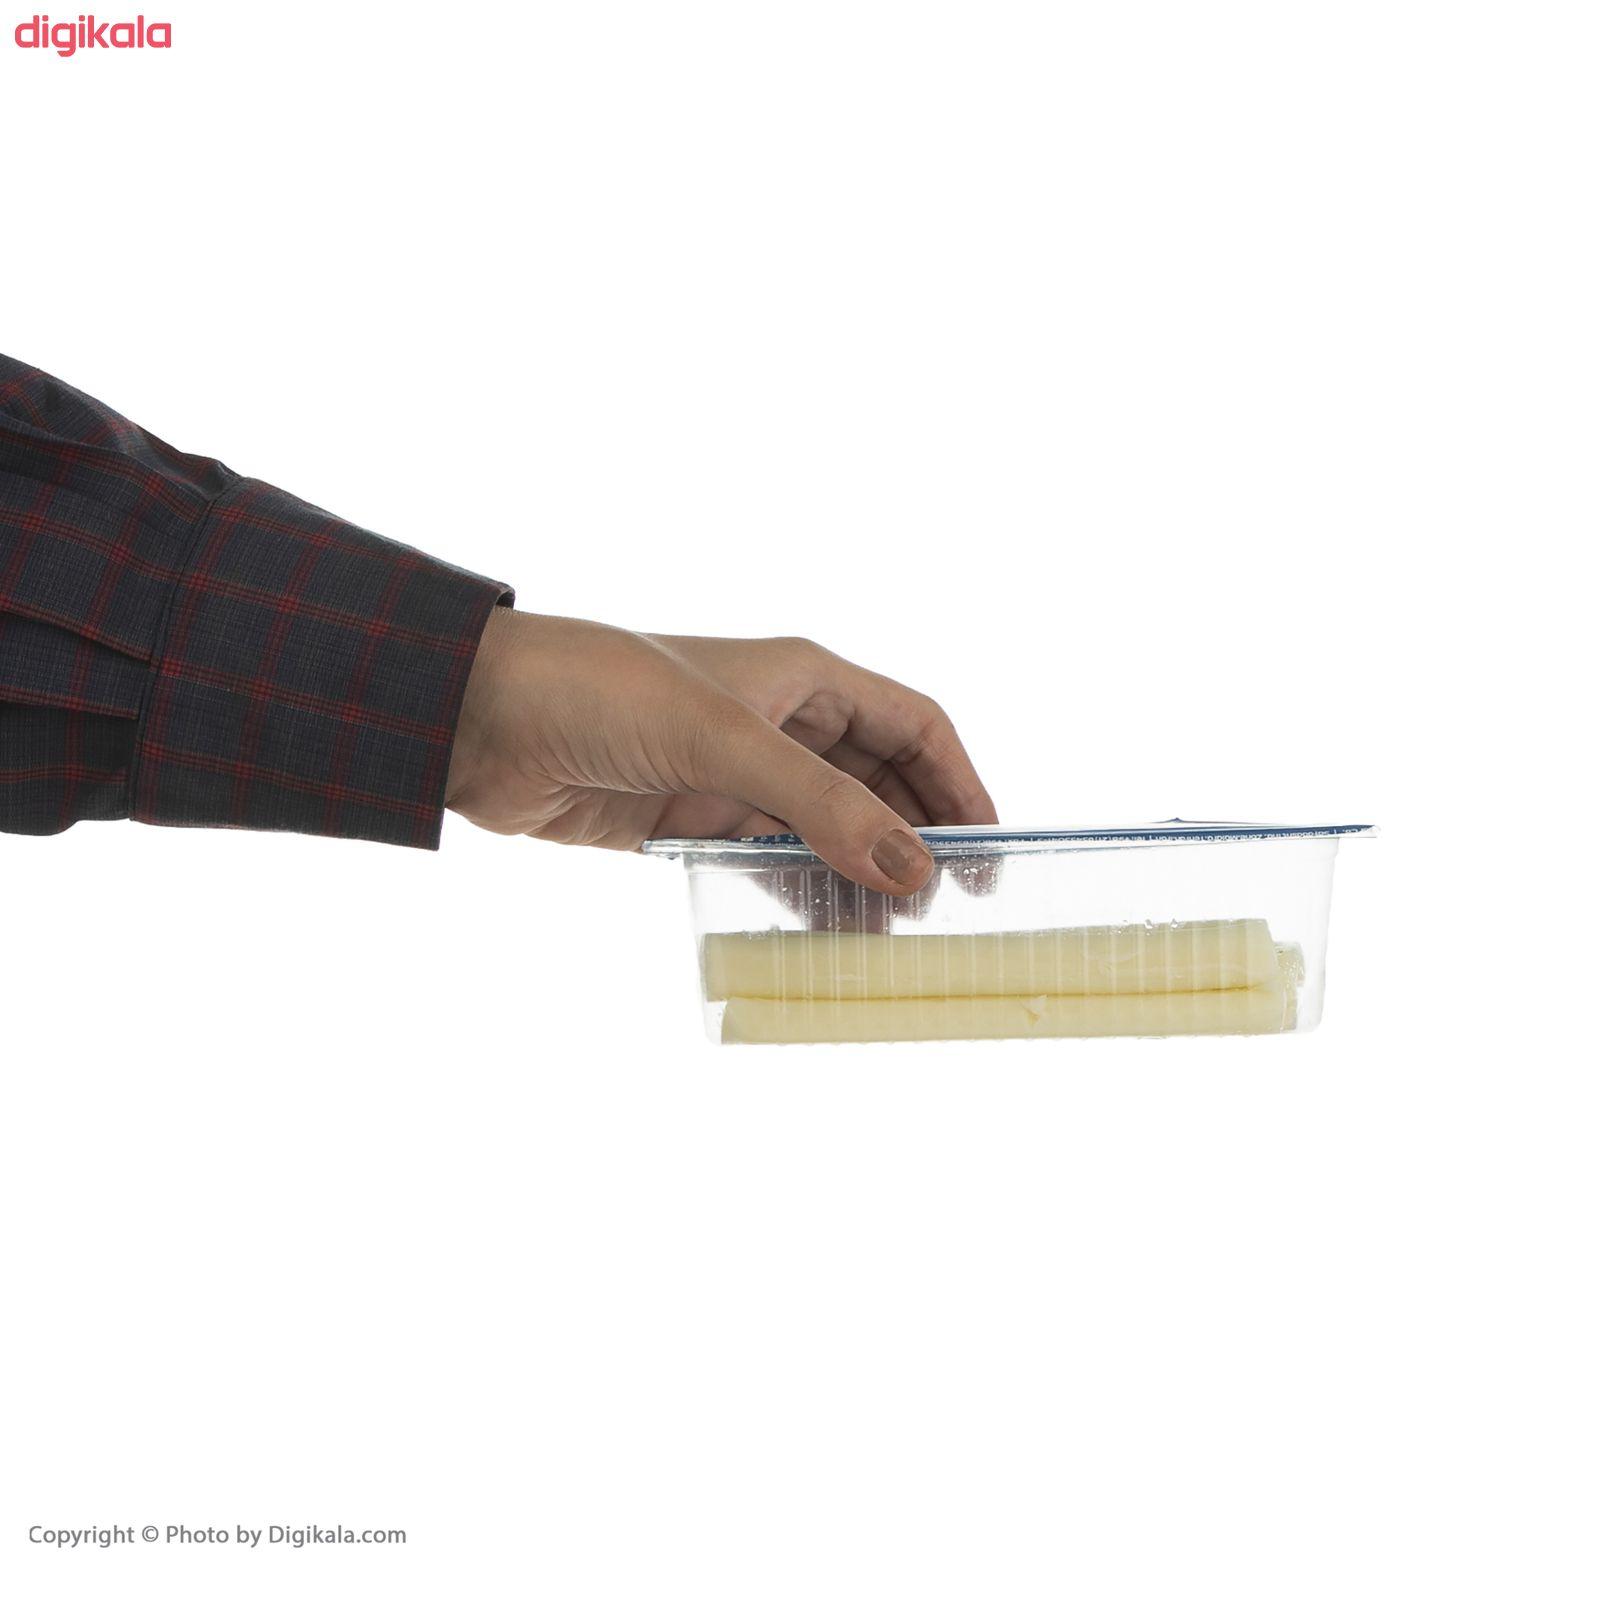 پنیر استیک مدادی کالین مقدار 200 گرم main 1 4